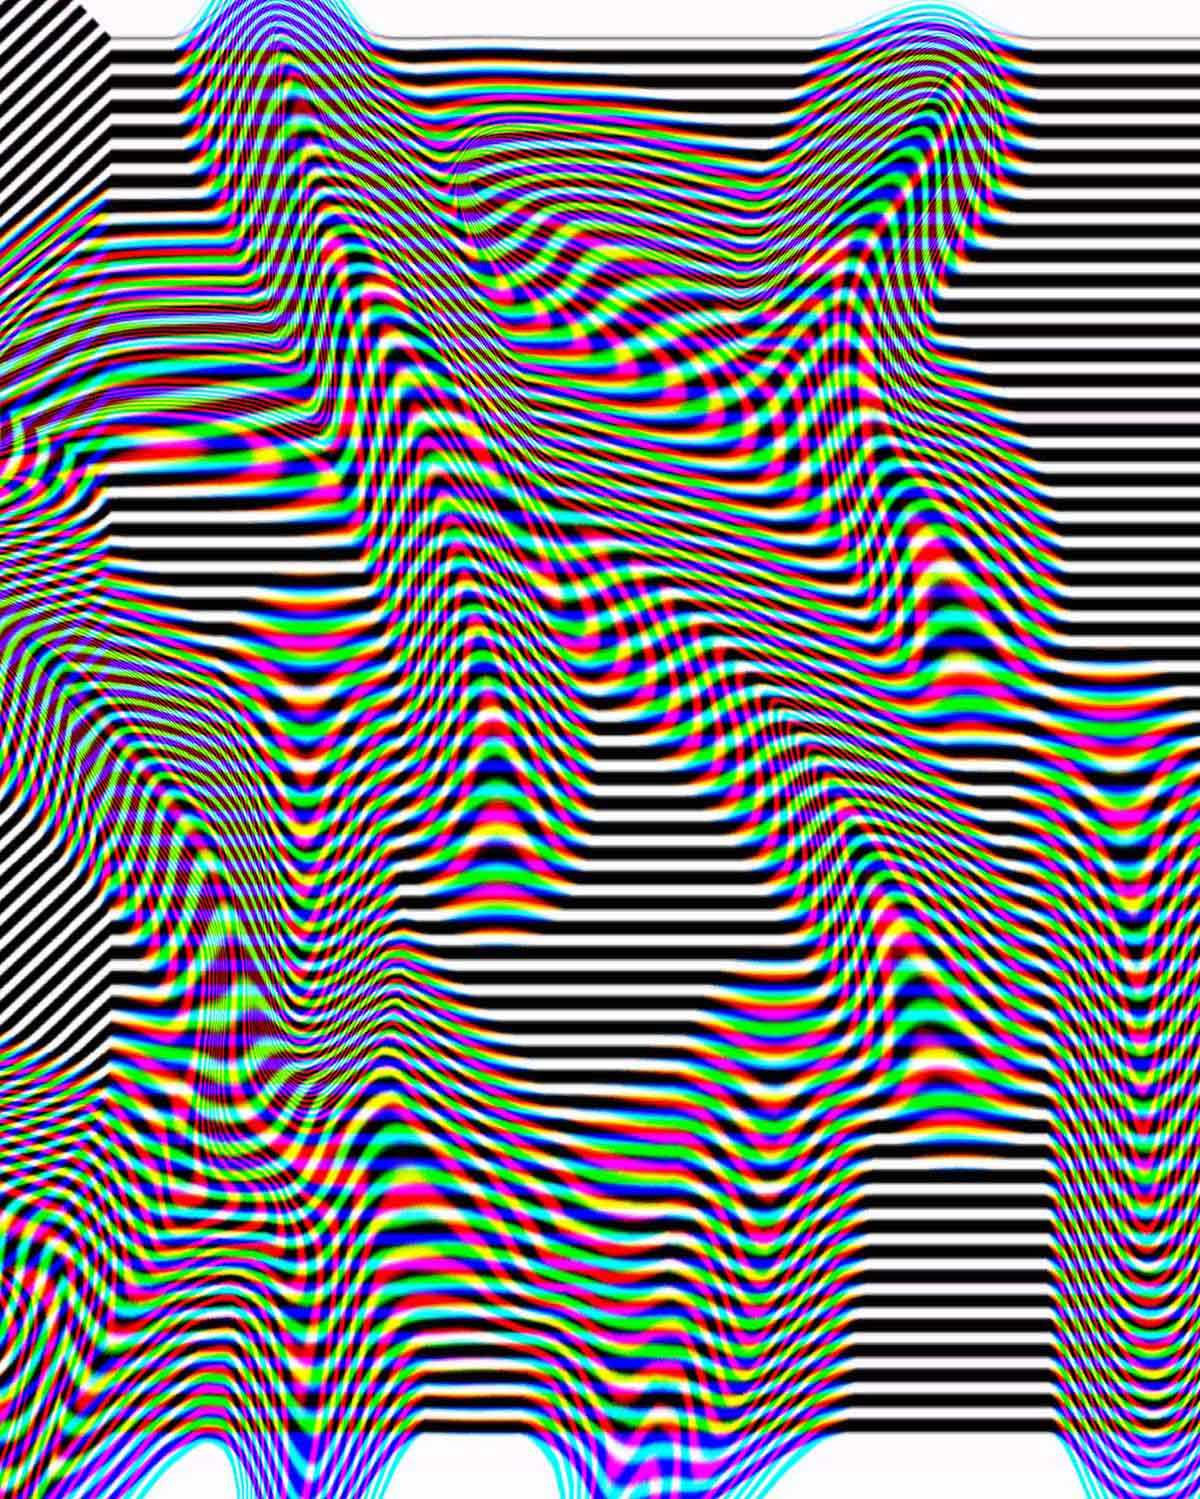 Trippy__4.jpg